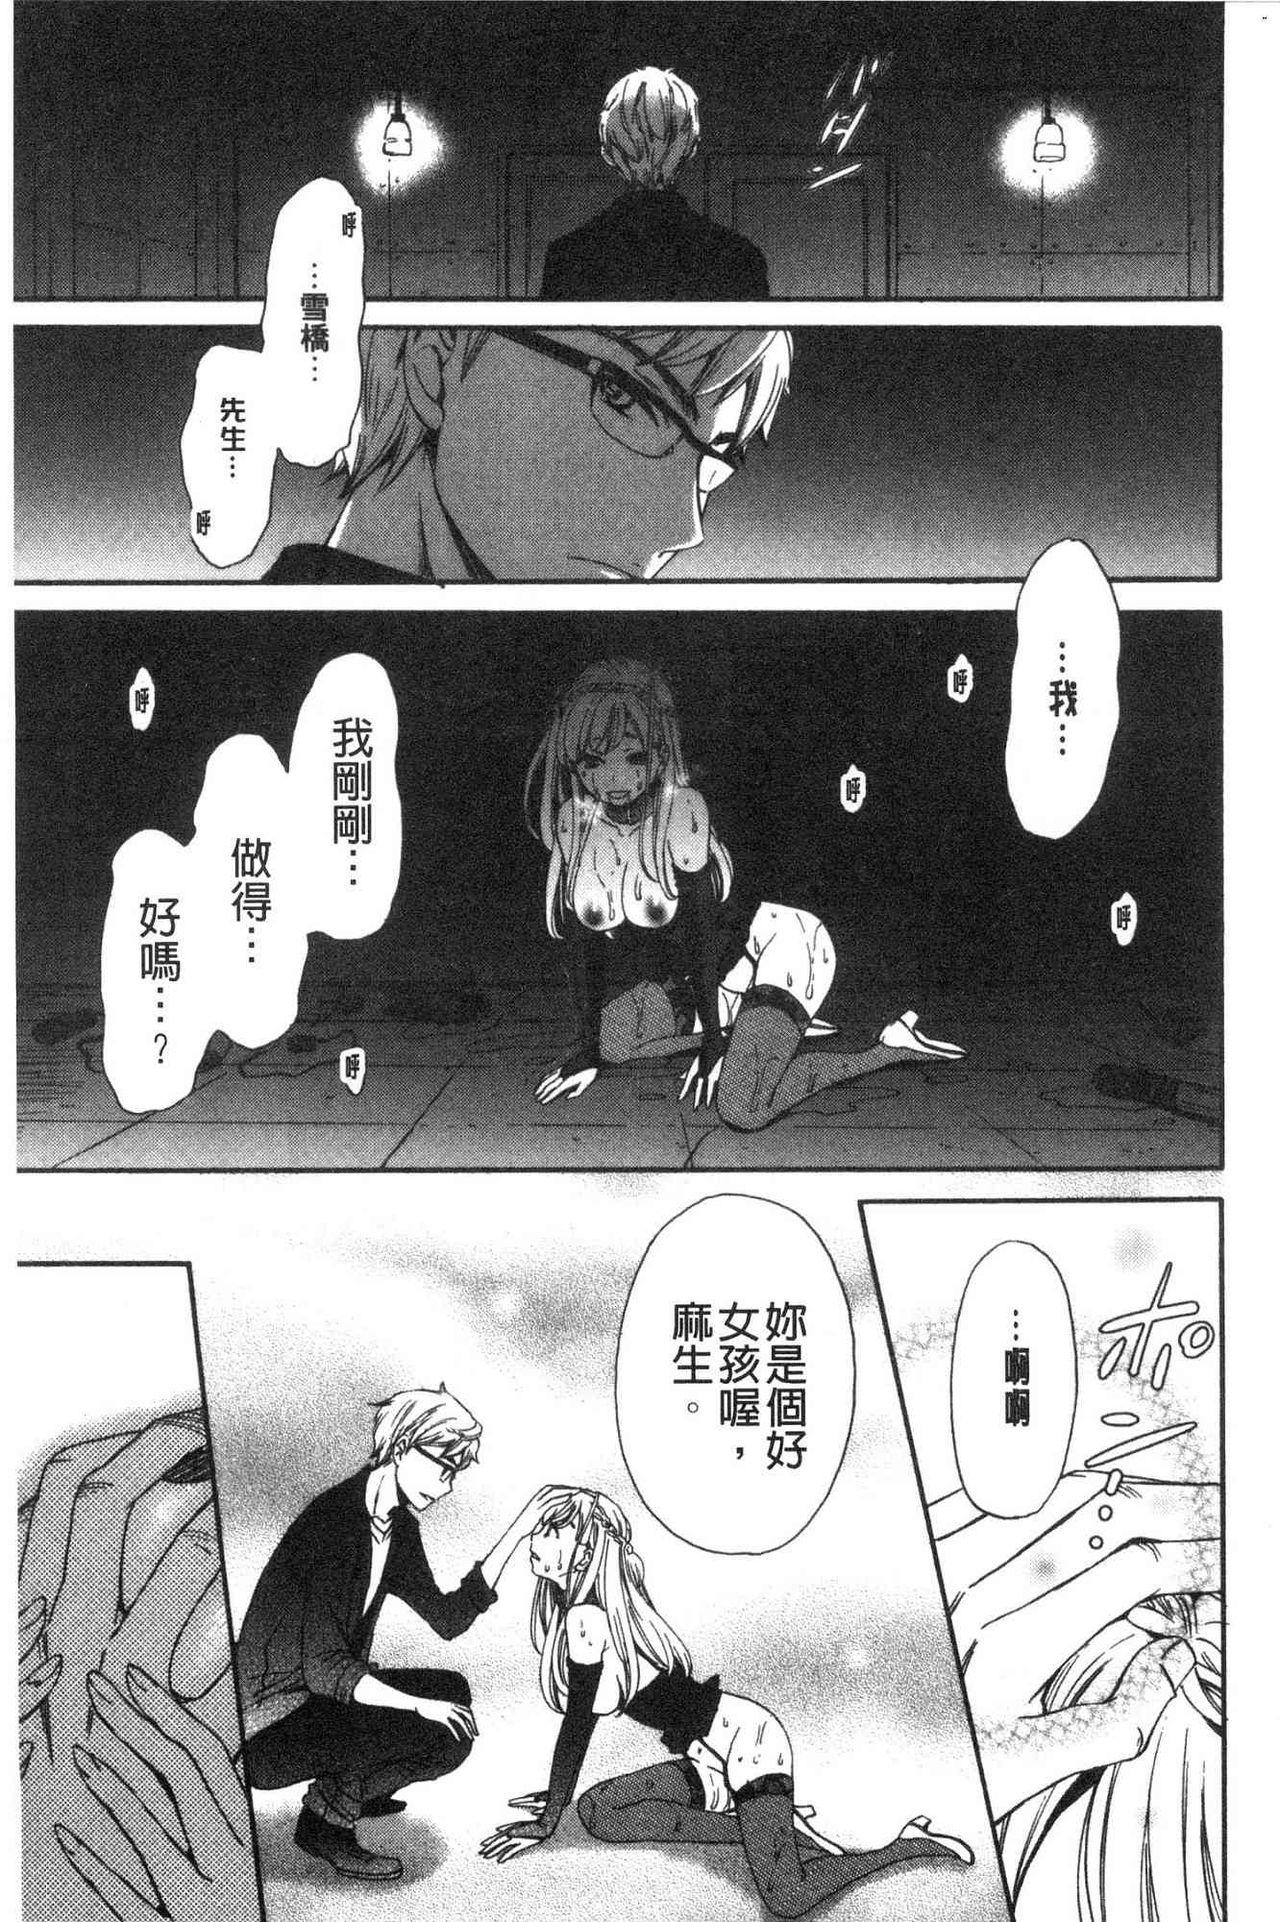 [Gotoh Akira]  21-ji no Onna ~Camera no Mae no Mesuinu~ 2 | 21時之女 ~鏡頭前的牝犬~ 2 [Chinese] 94